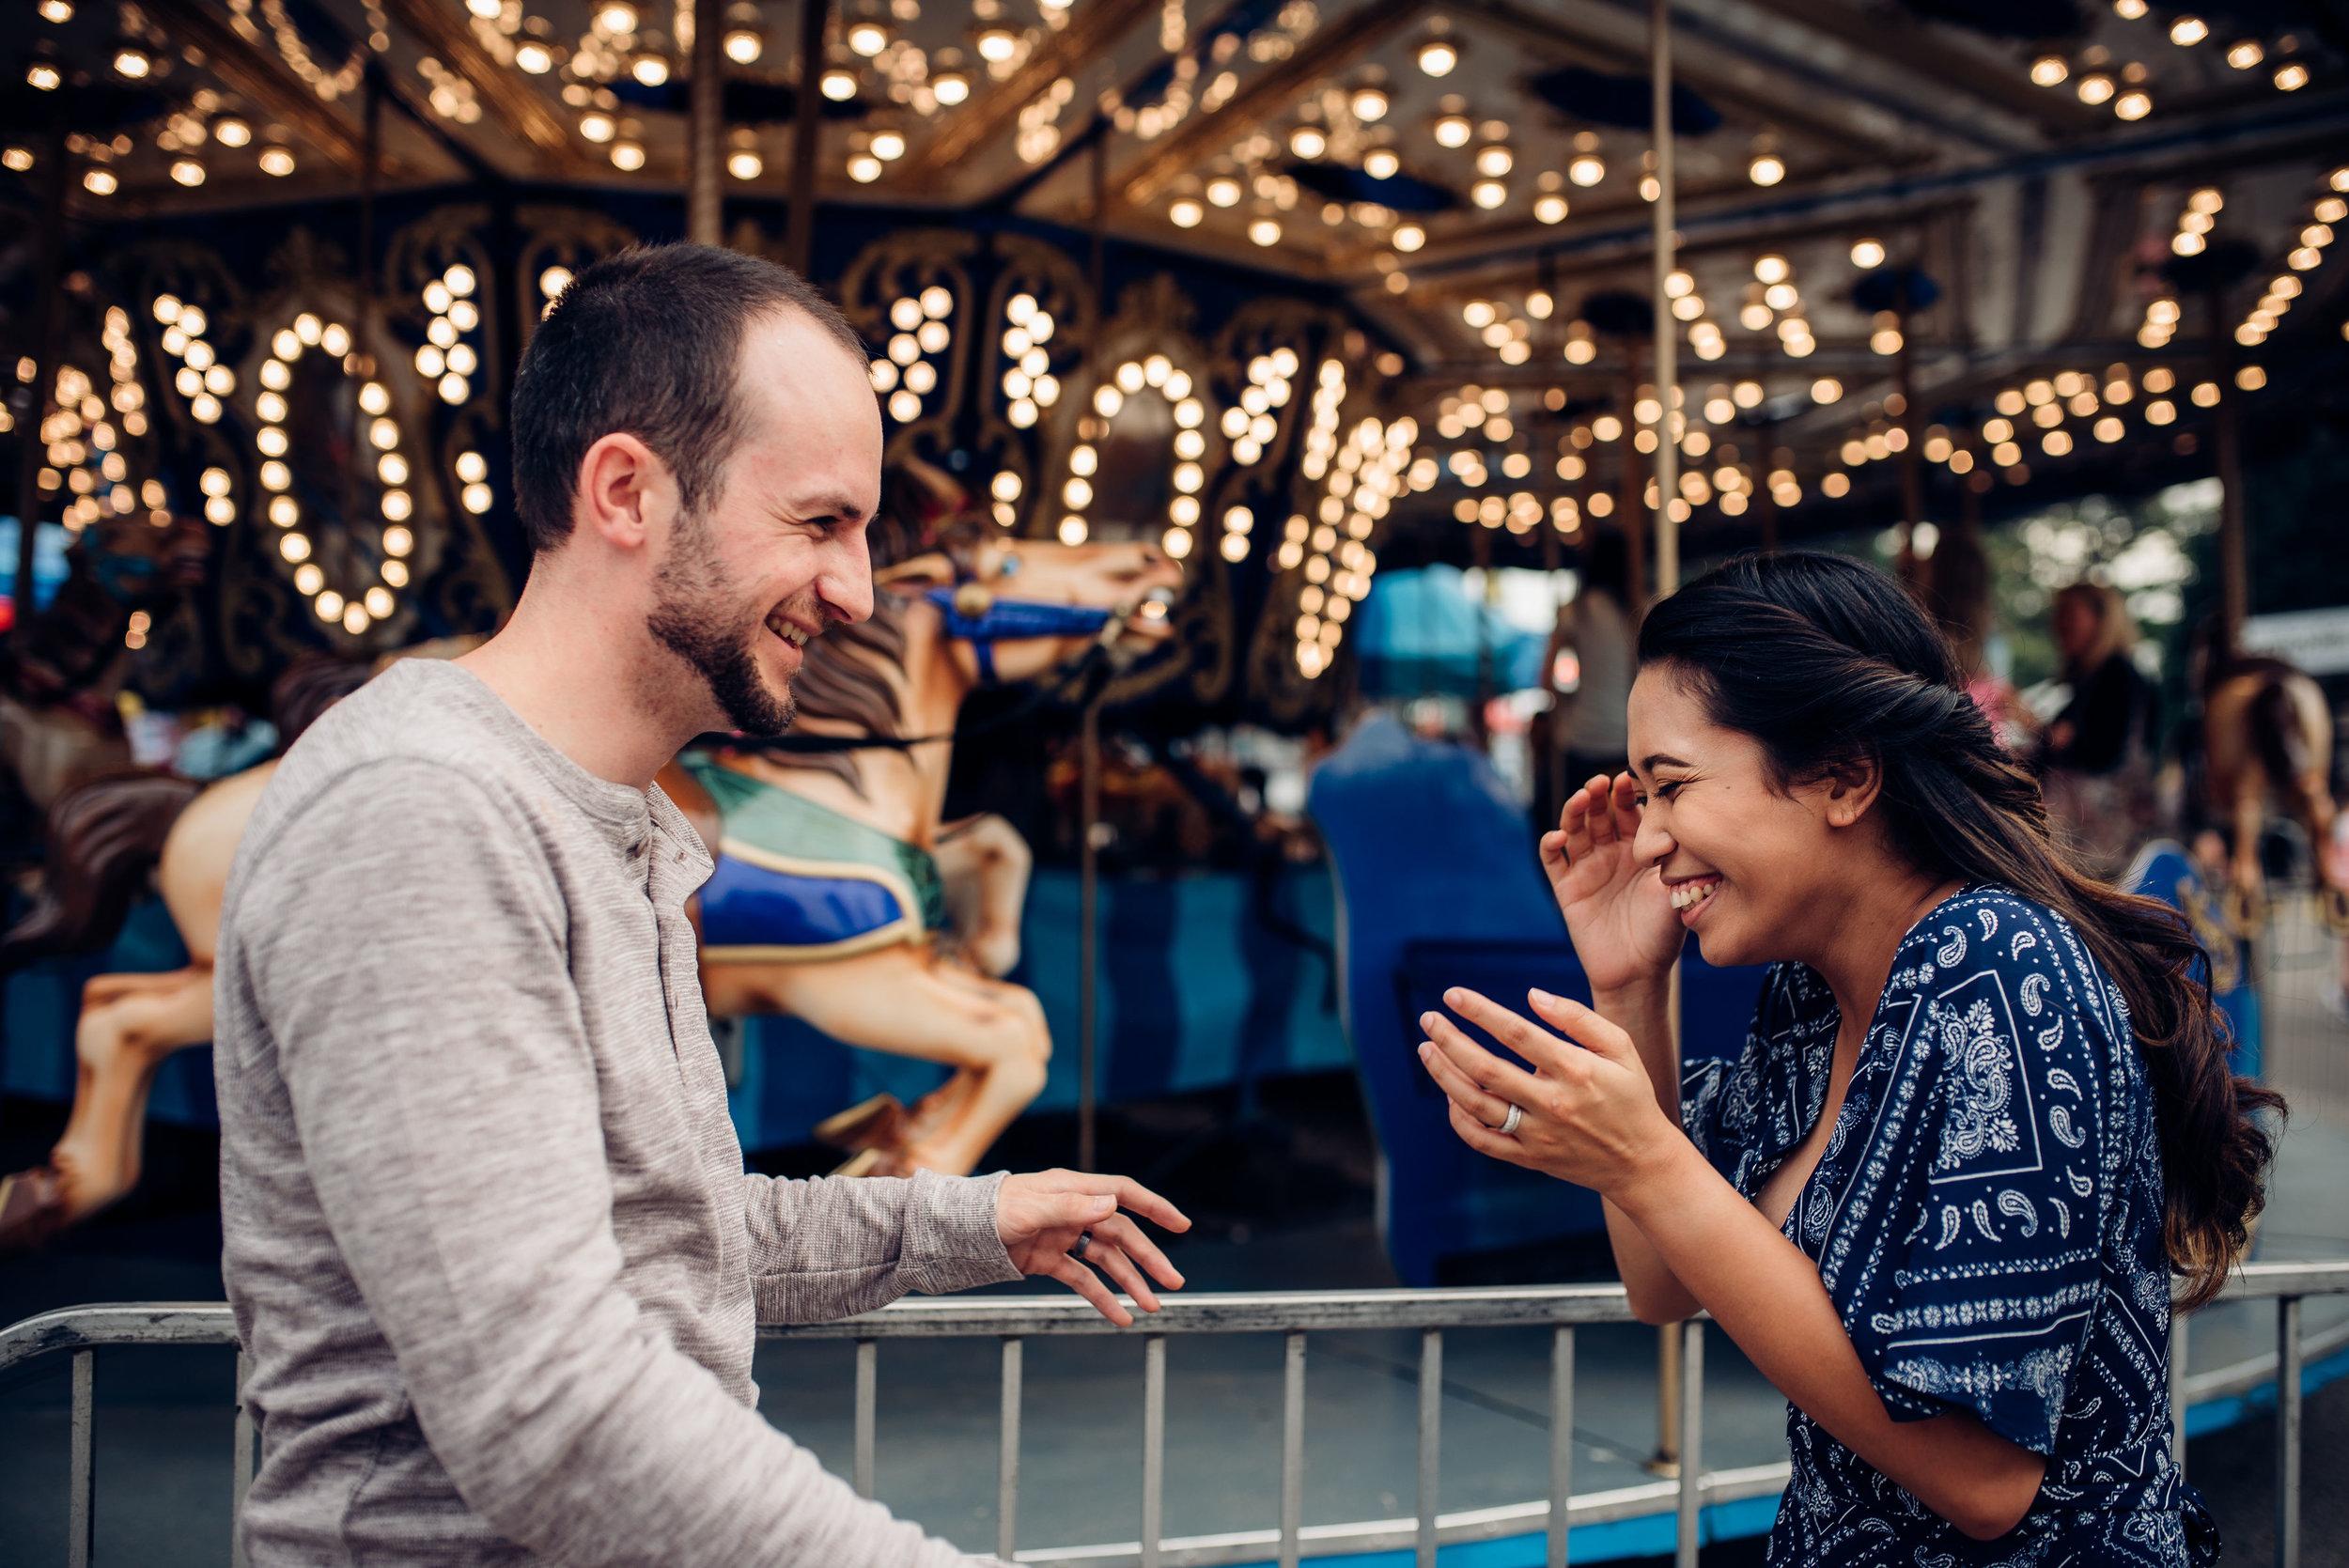 nc state fair engagement session - raleigh wedding photographer - north carolina wedding photographer